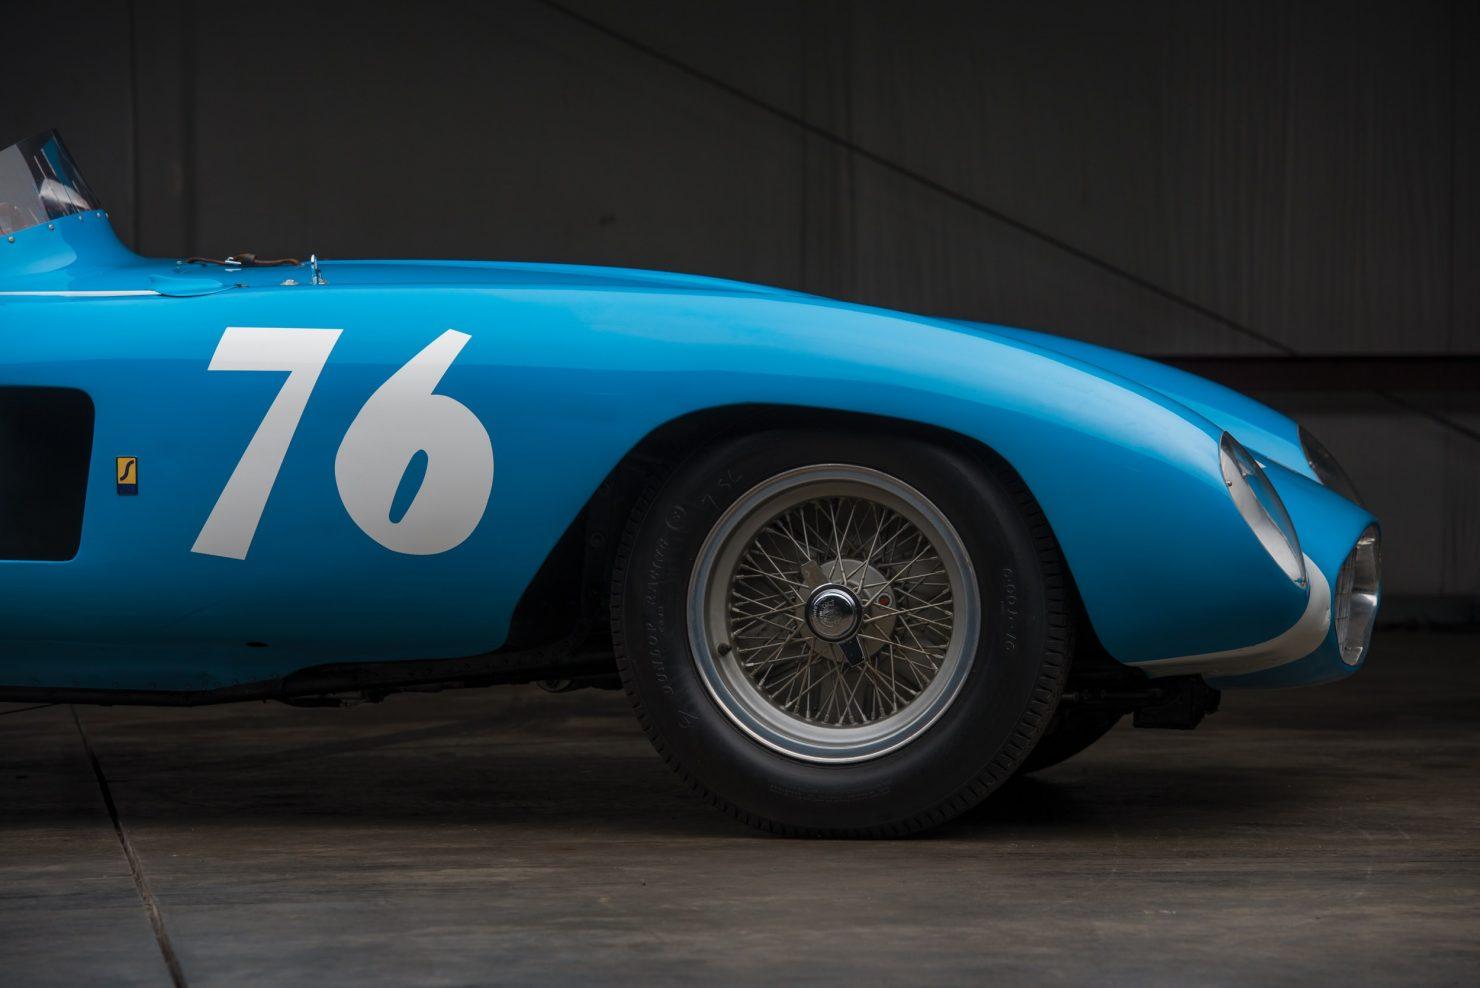 ferrari 121 lm spider 16 1480x988 - 1955 Ferrari 121 LM